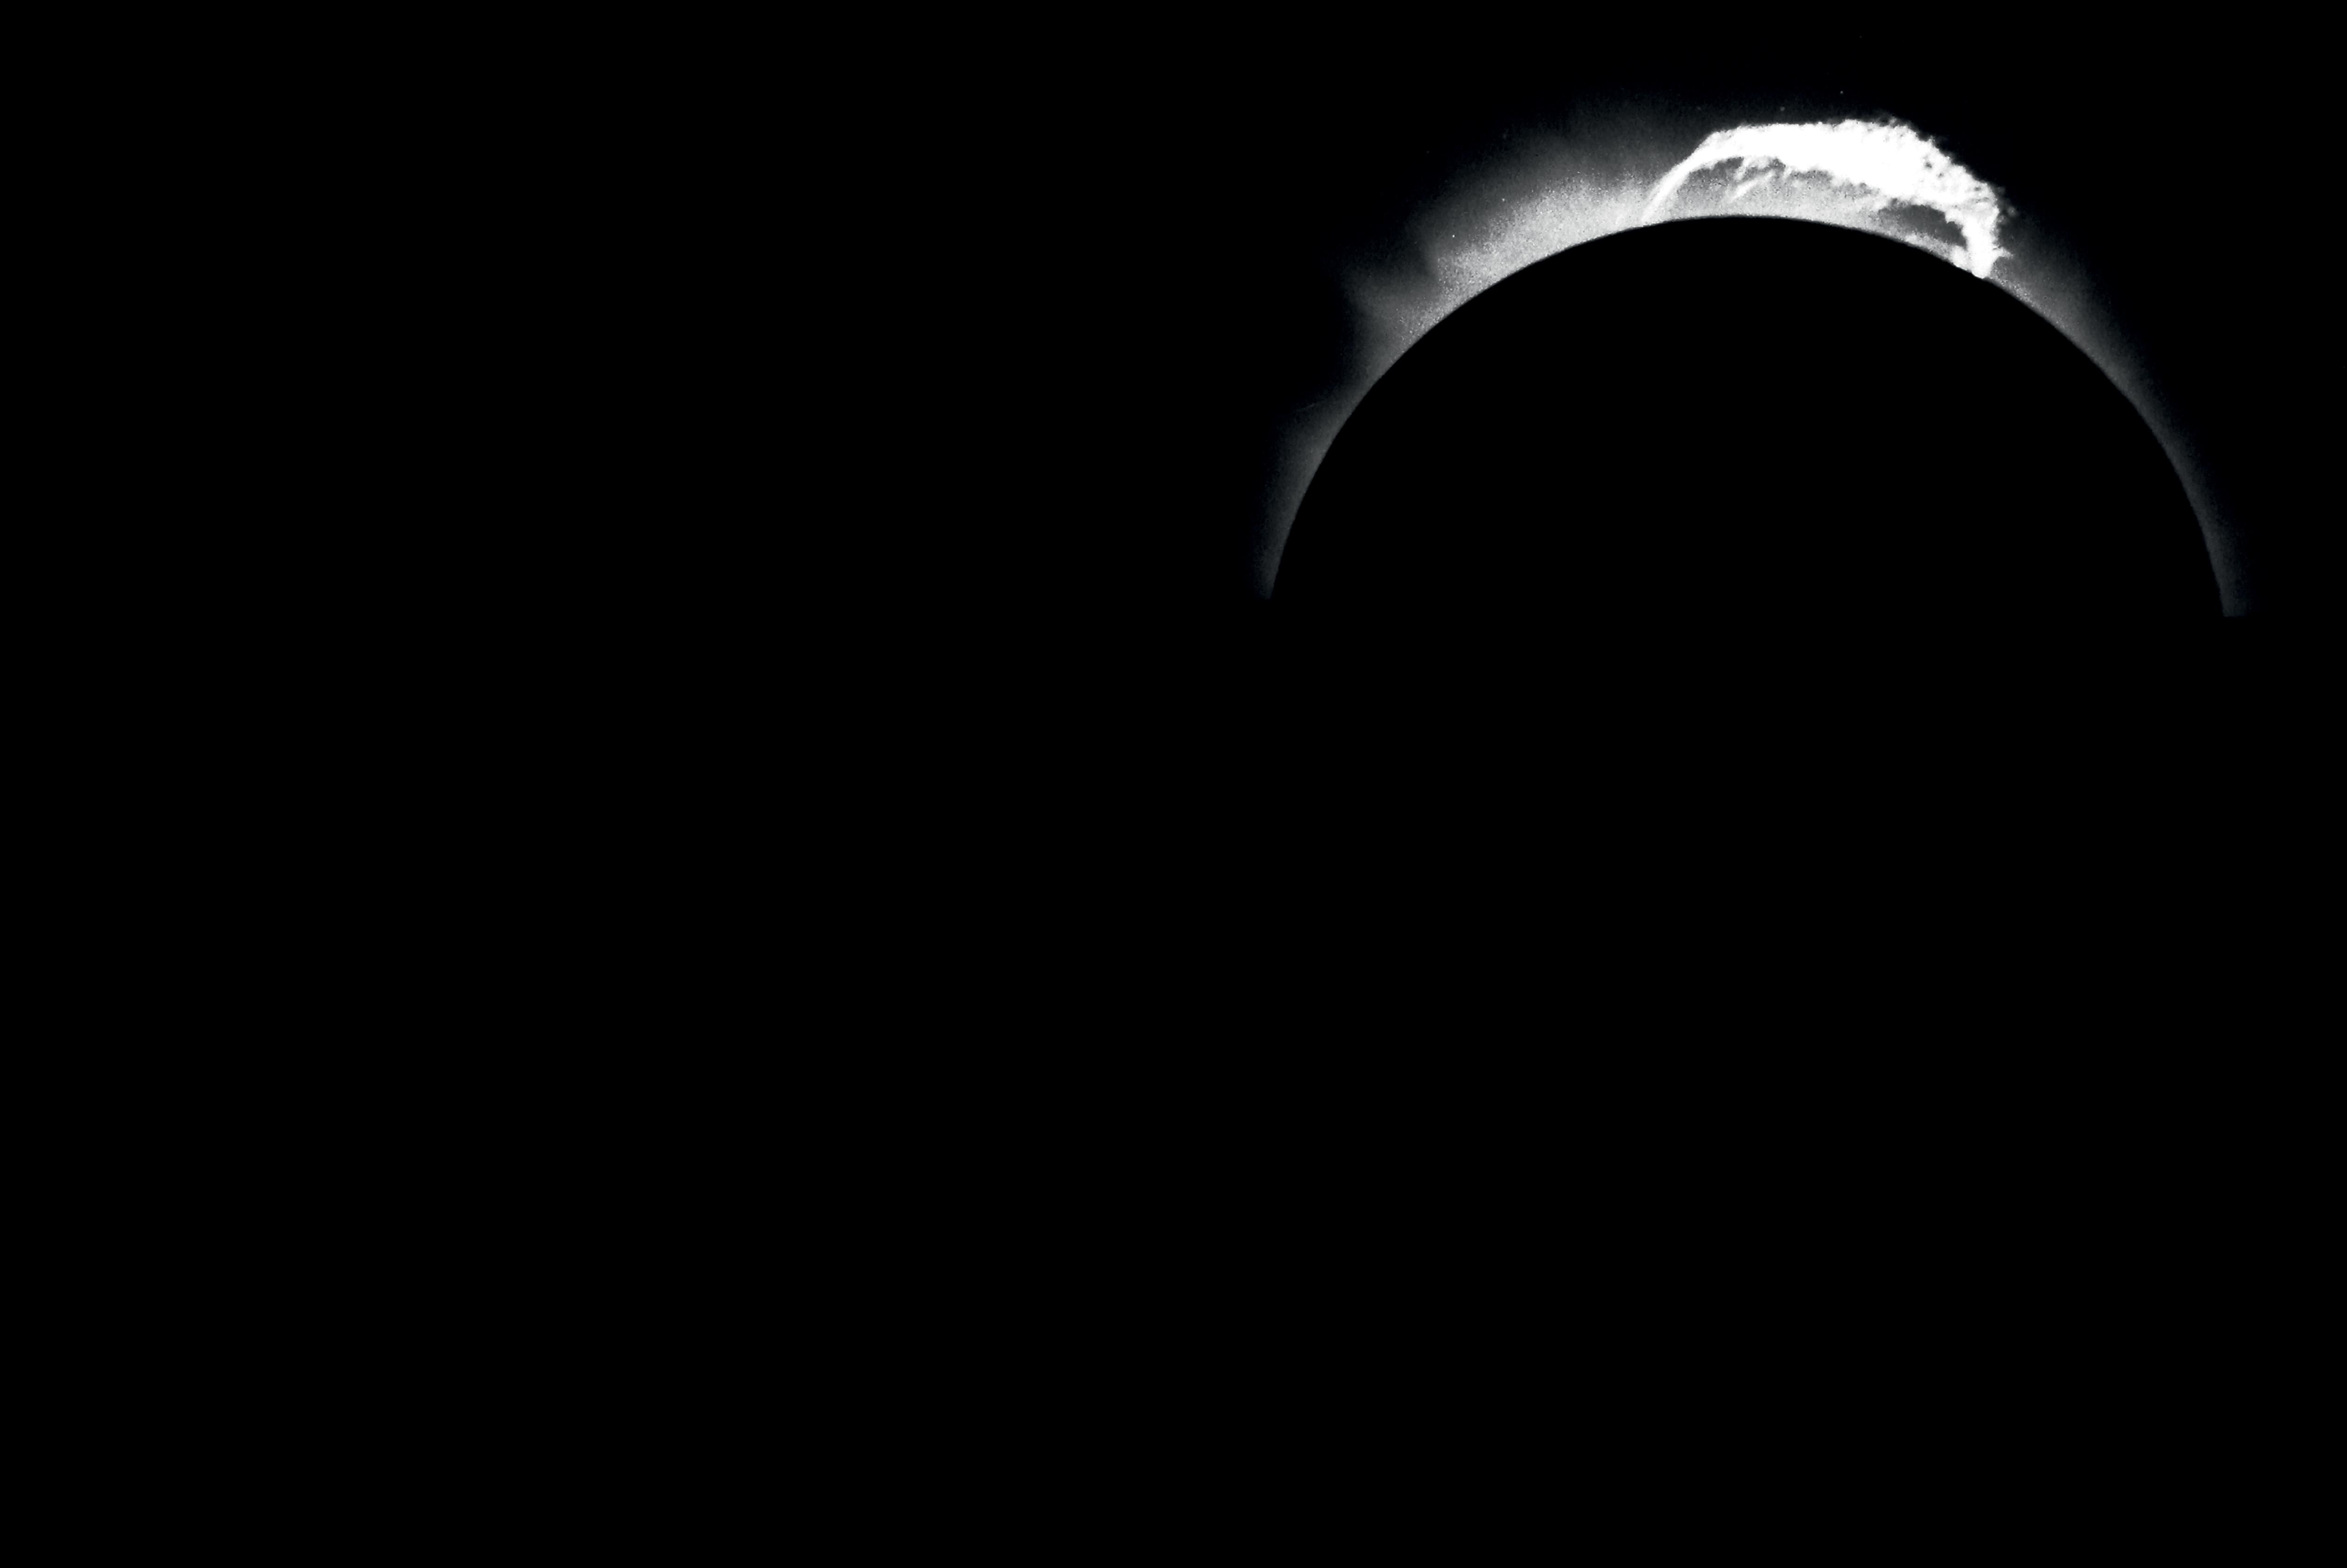 sobral_eclipse_03